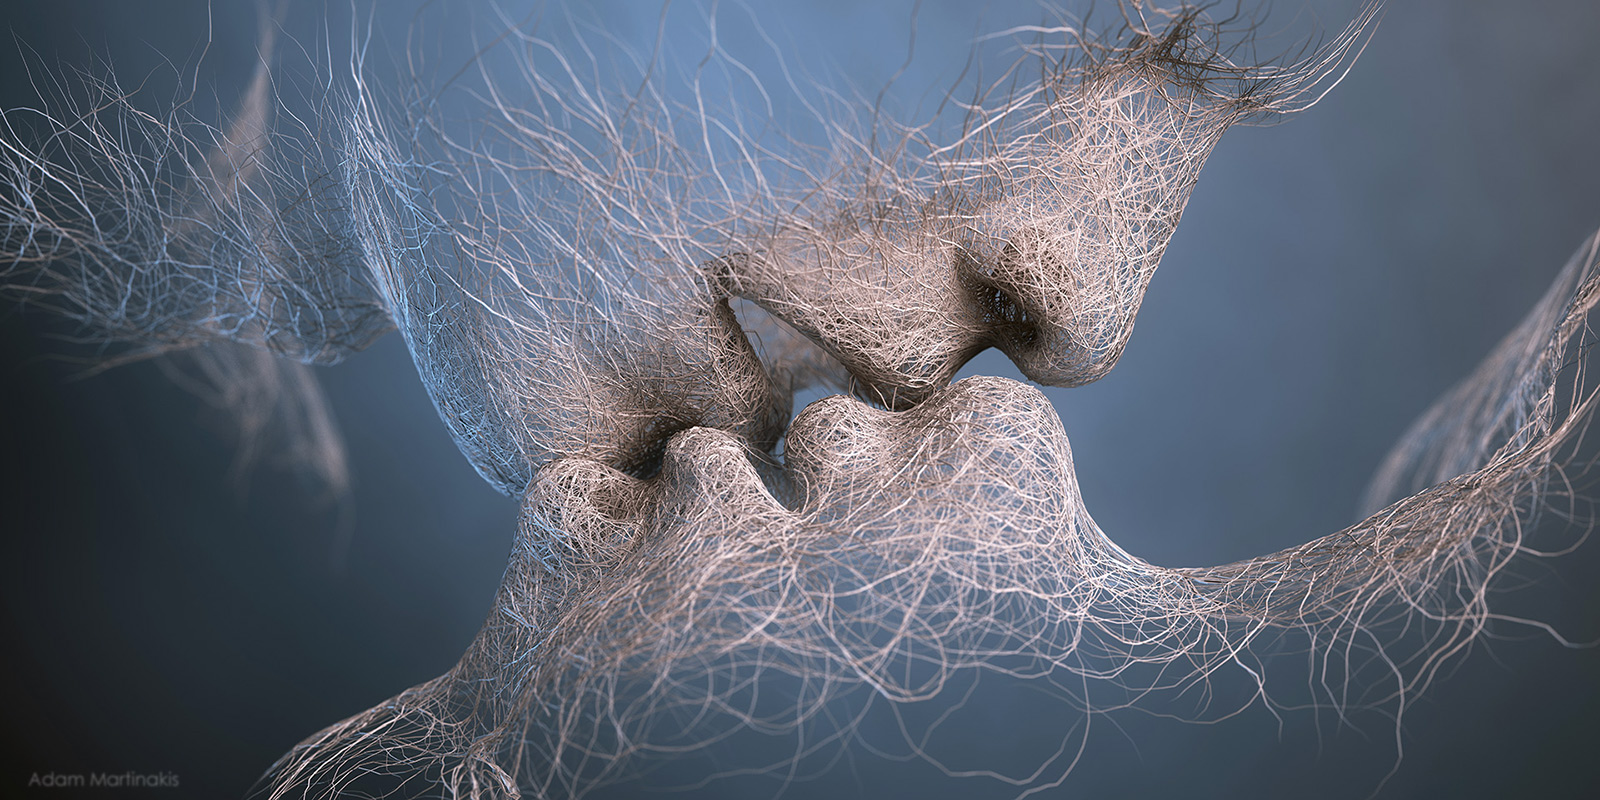 http://4.bp.blogspot.com/-zYp8RjxKi4M/Tp3FuVYMNxI/AAAAAAAAA98/ALIUyHd_exc/s1600/last-kiss_1600.jpg